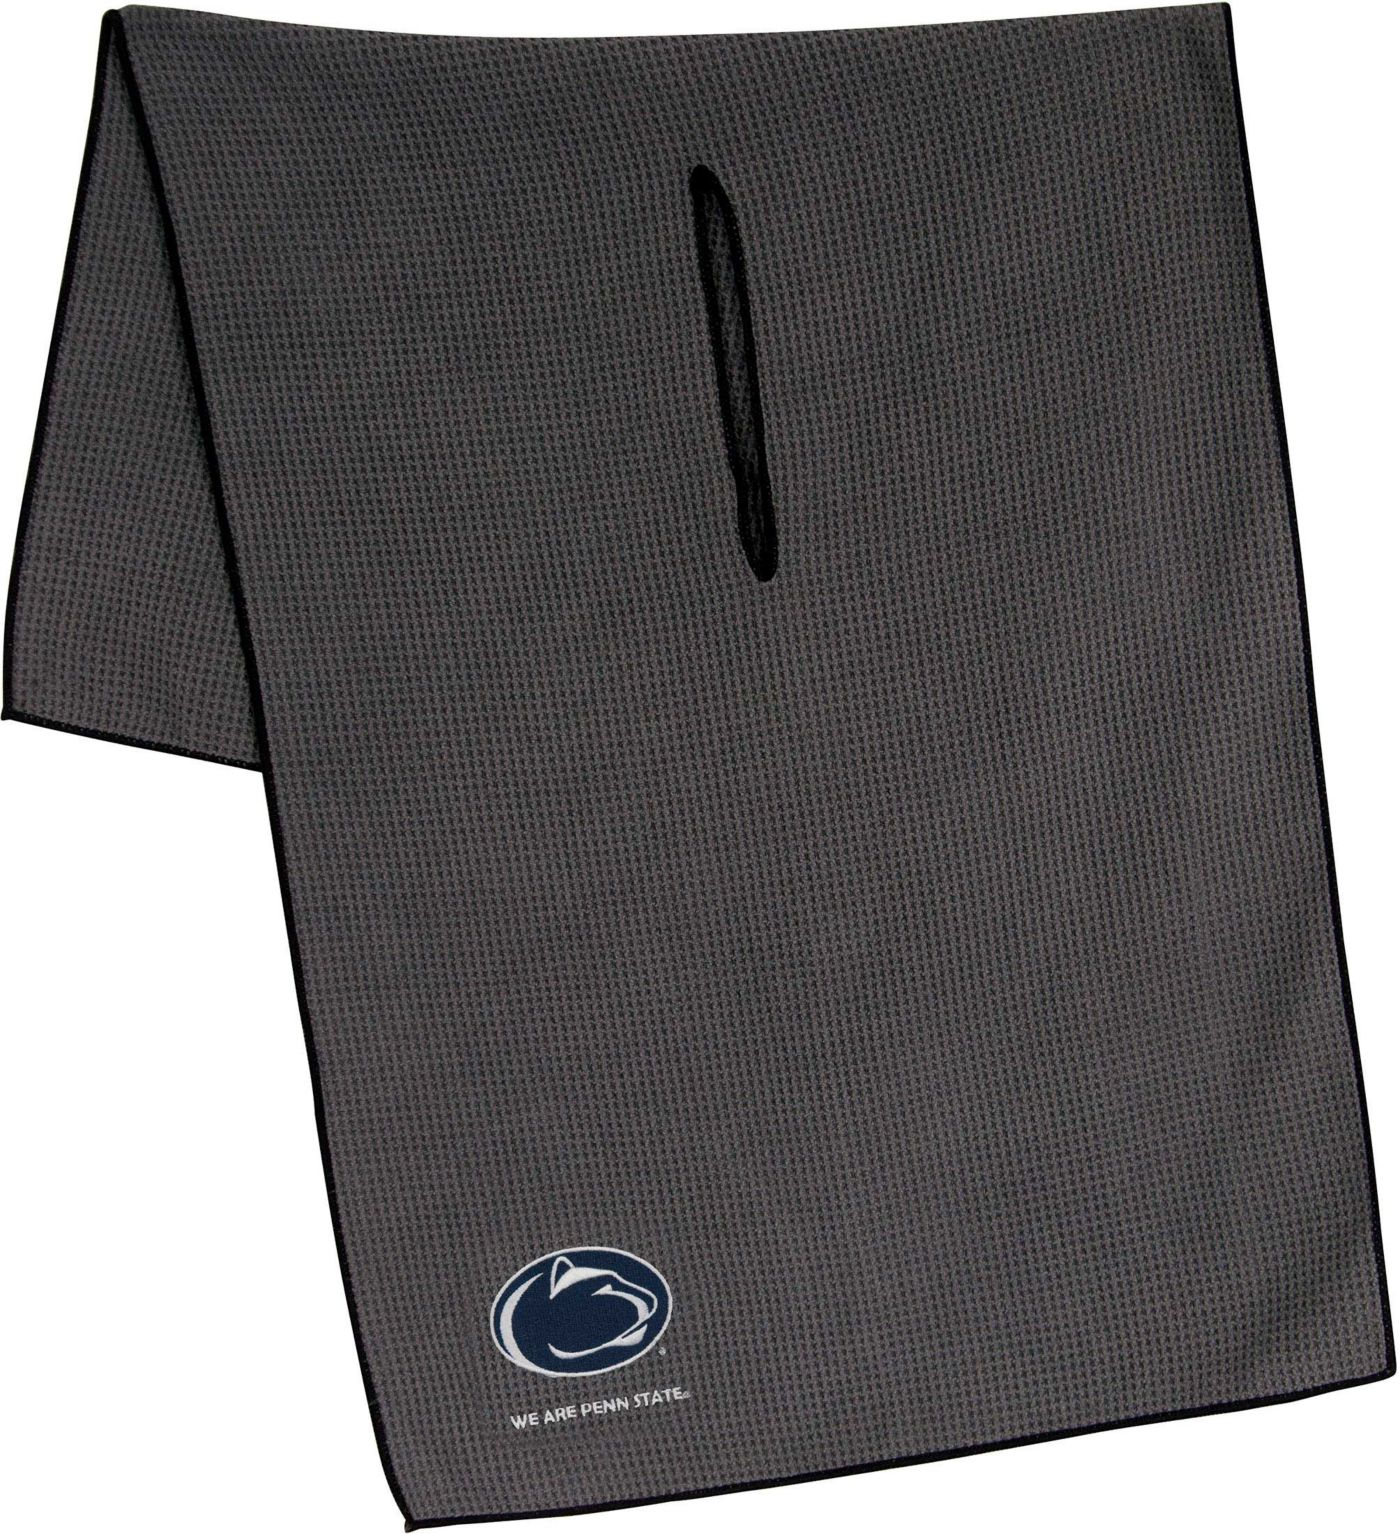 "Team Effort Penn State Nittany Lions 19"" x 41"" Microfiber Golf Towel"